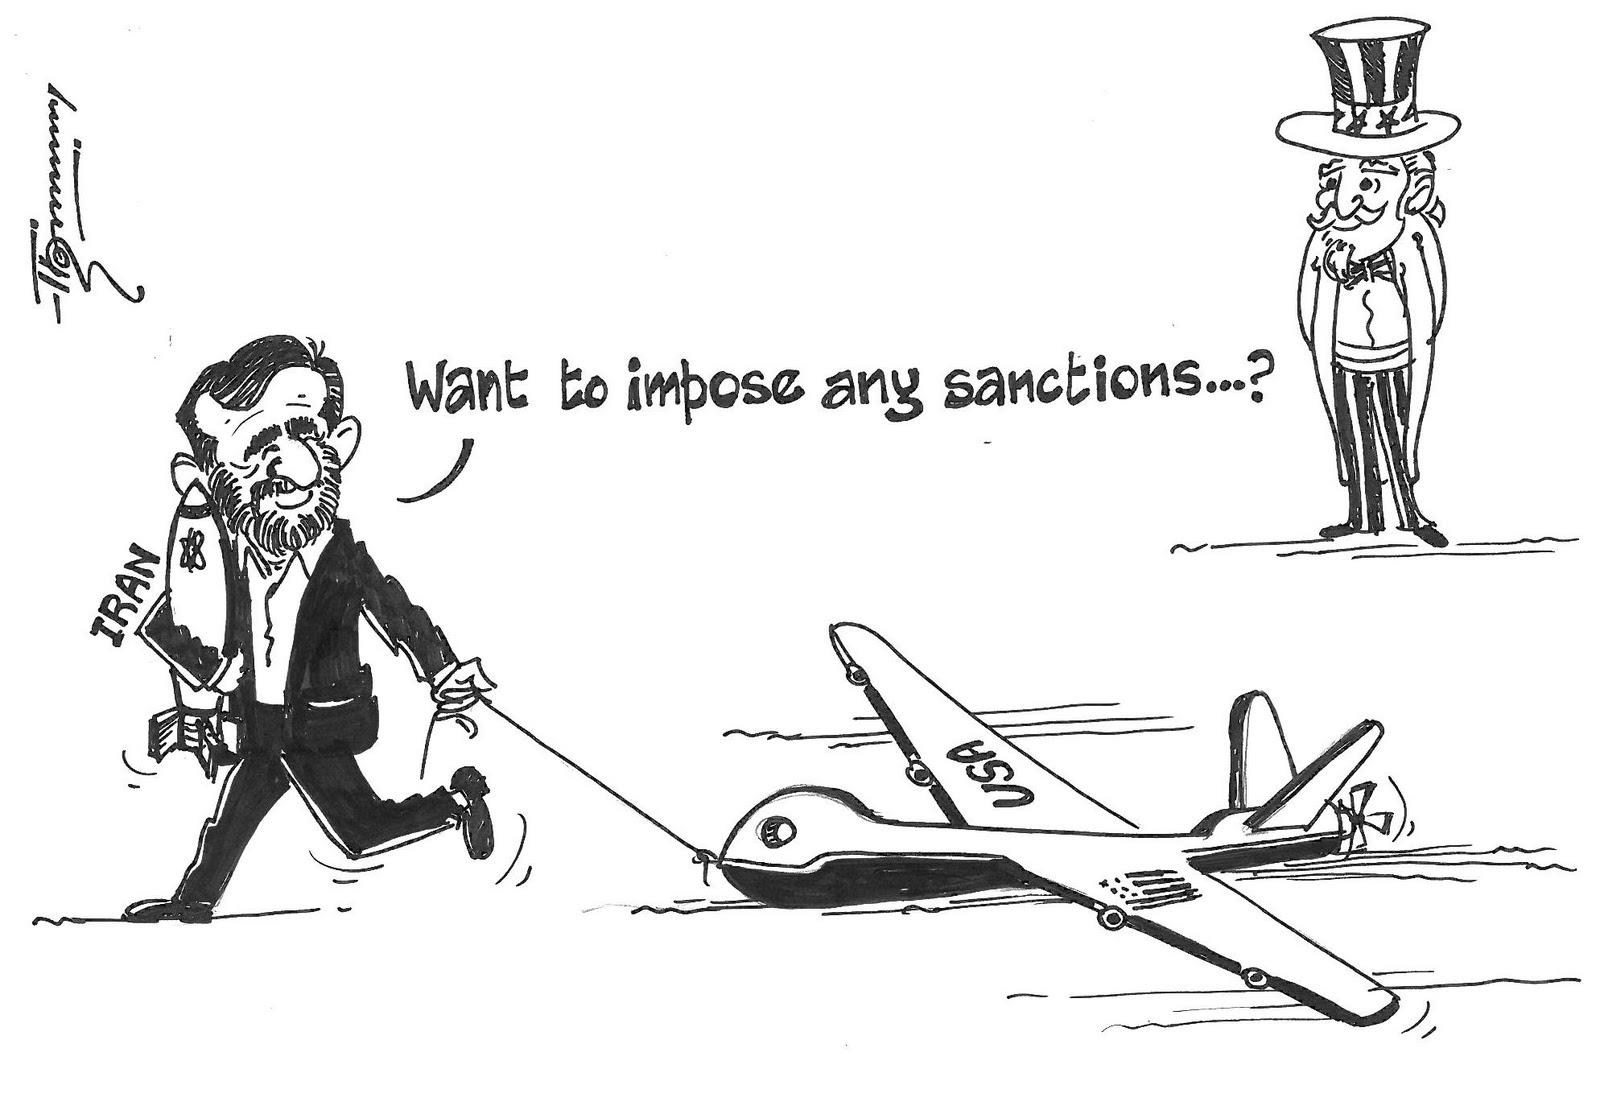 Drawn Opinions The Drone In Iran